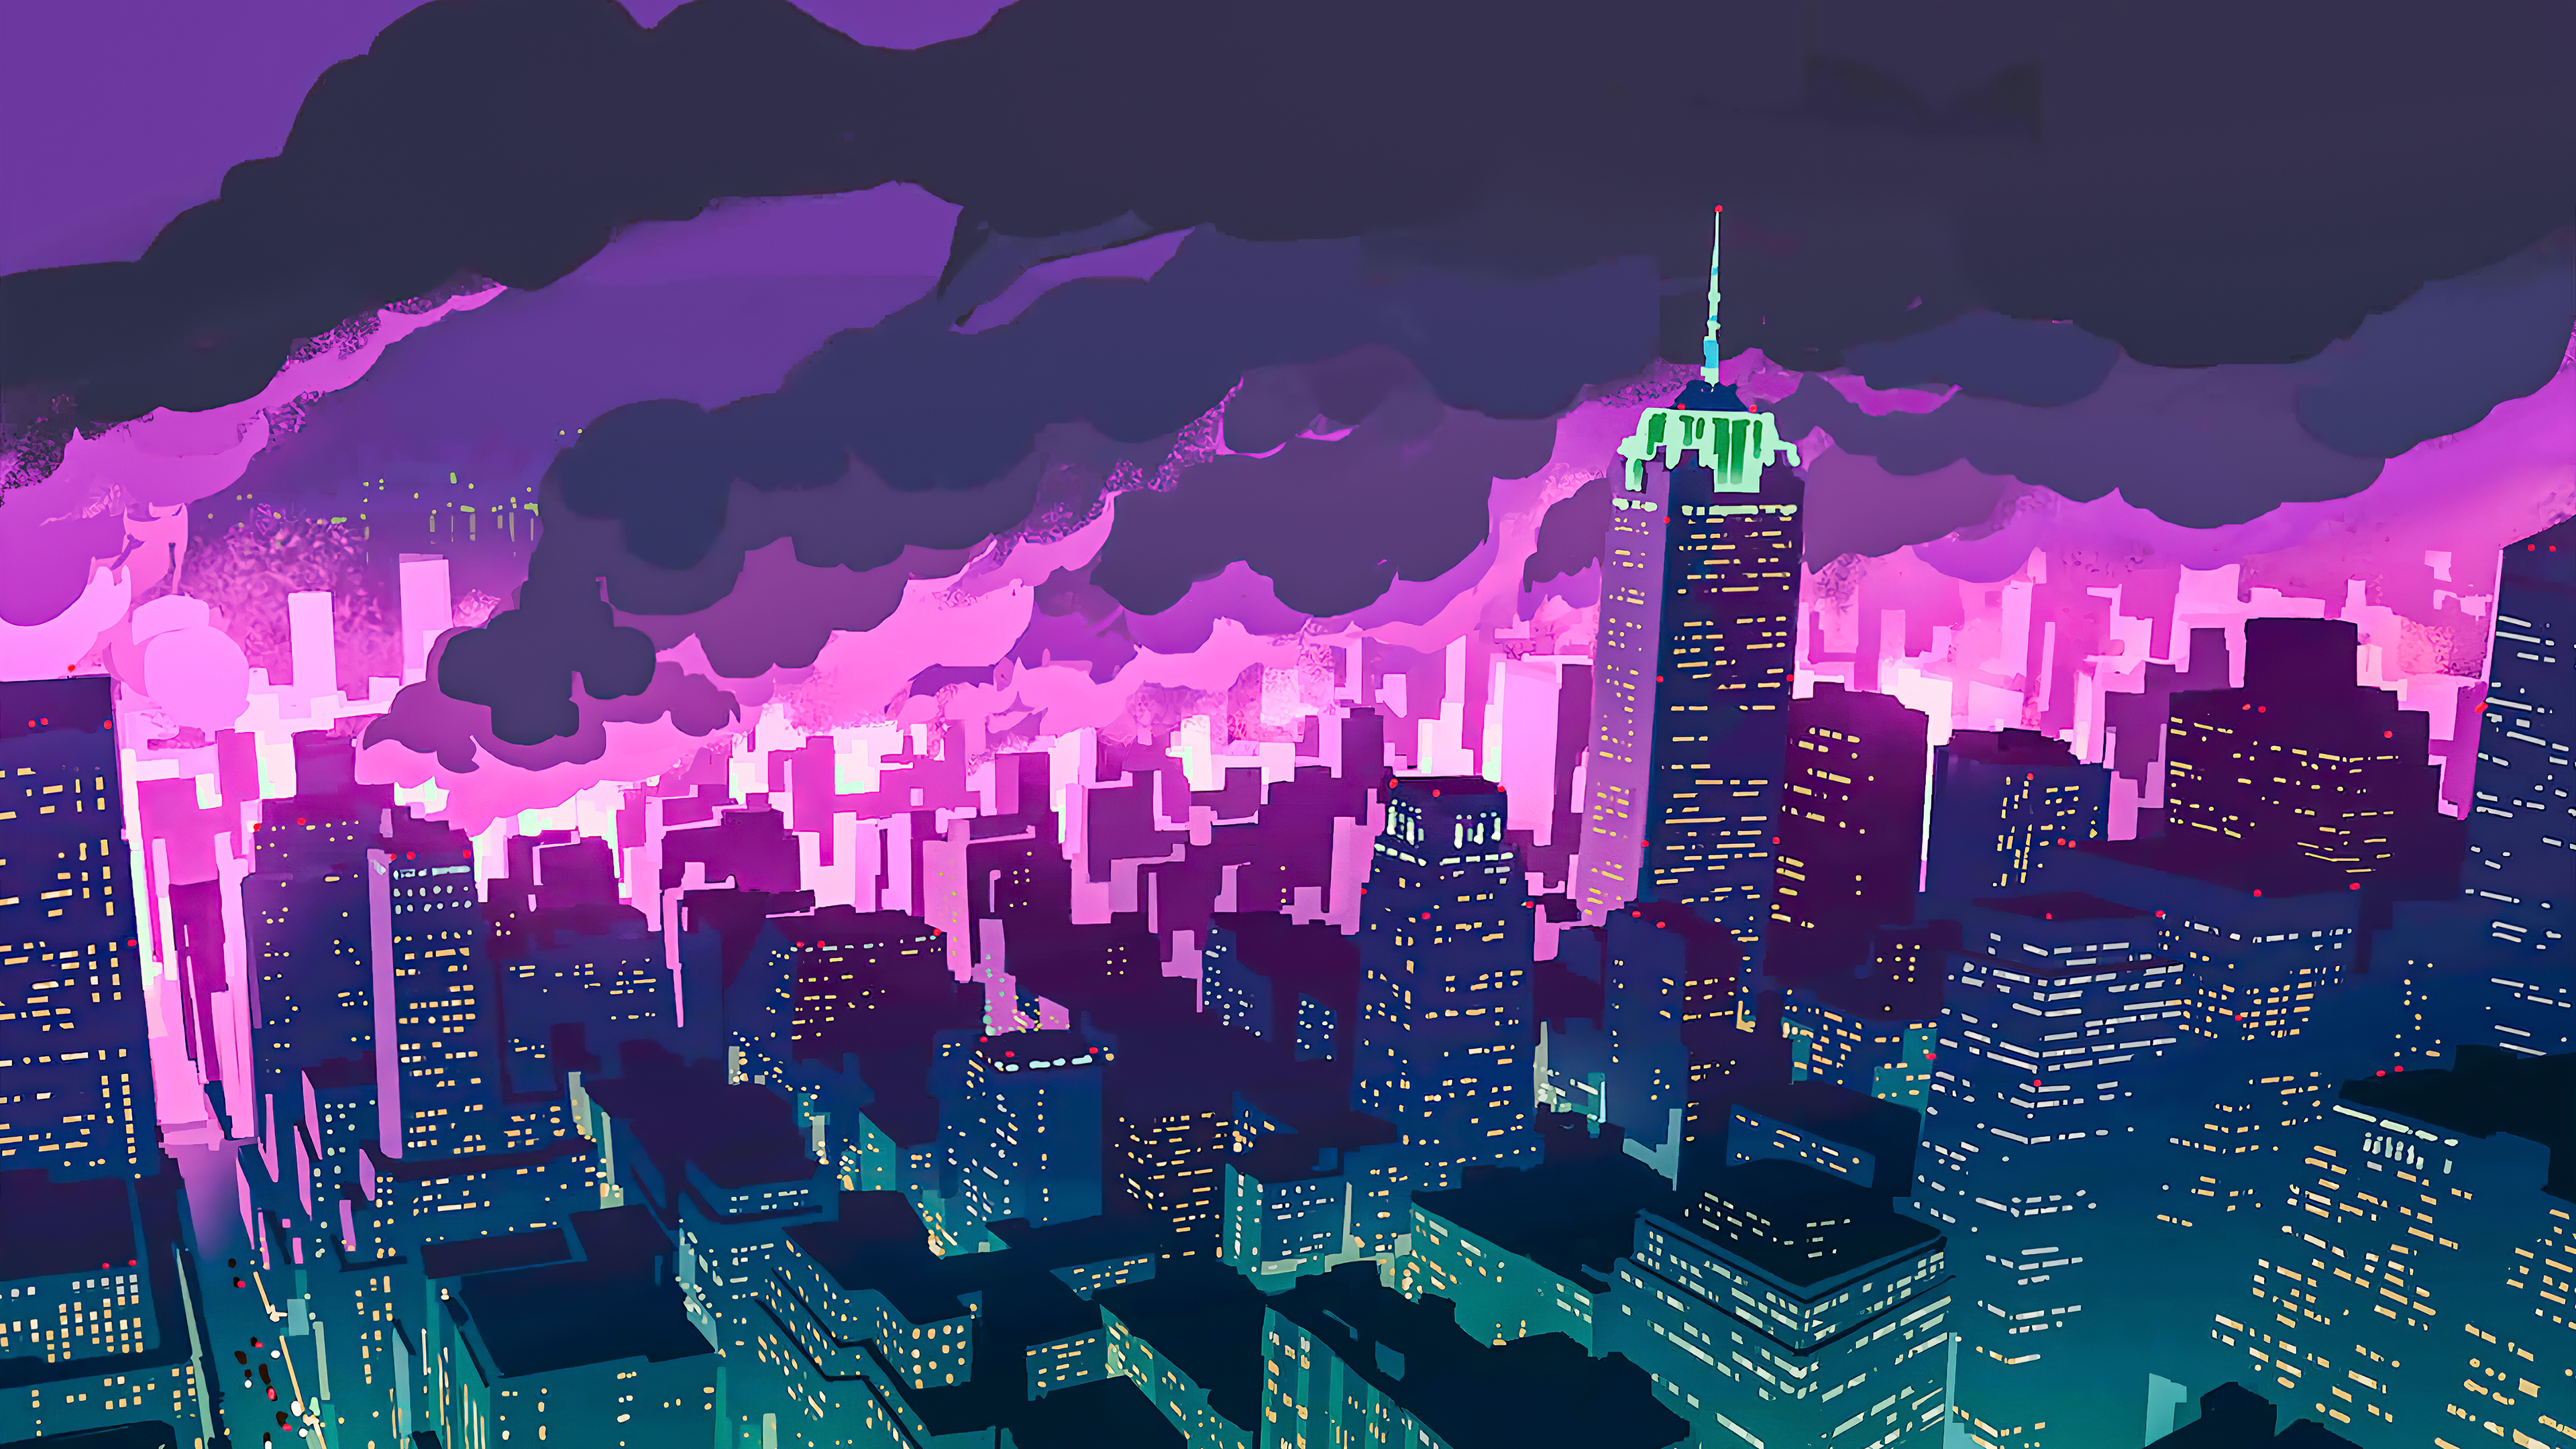 Promare Night City 3840x2160 In 2020 Anime City Anime Wallpaper City Wallpaper